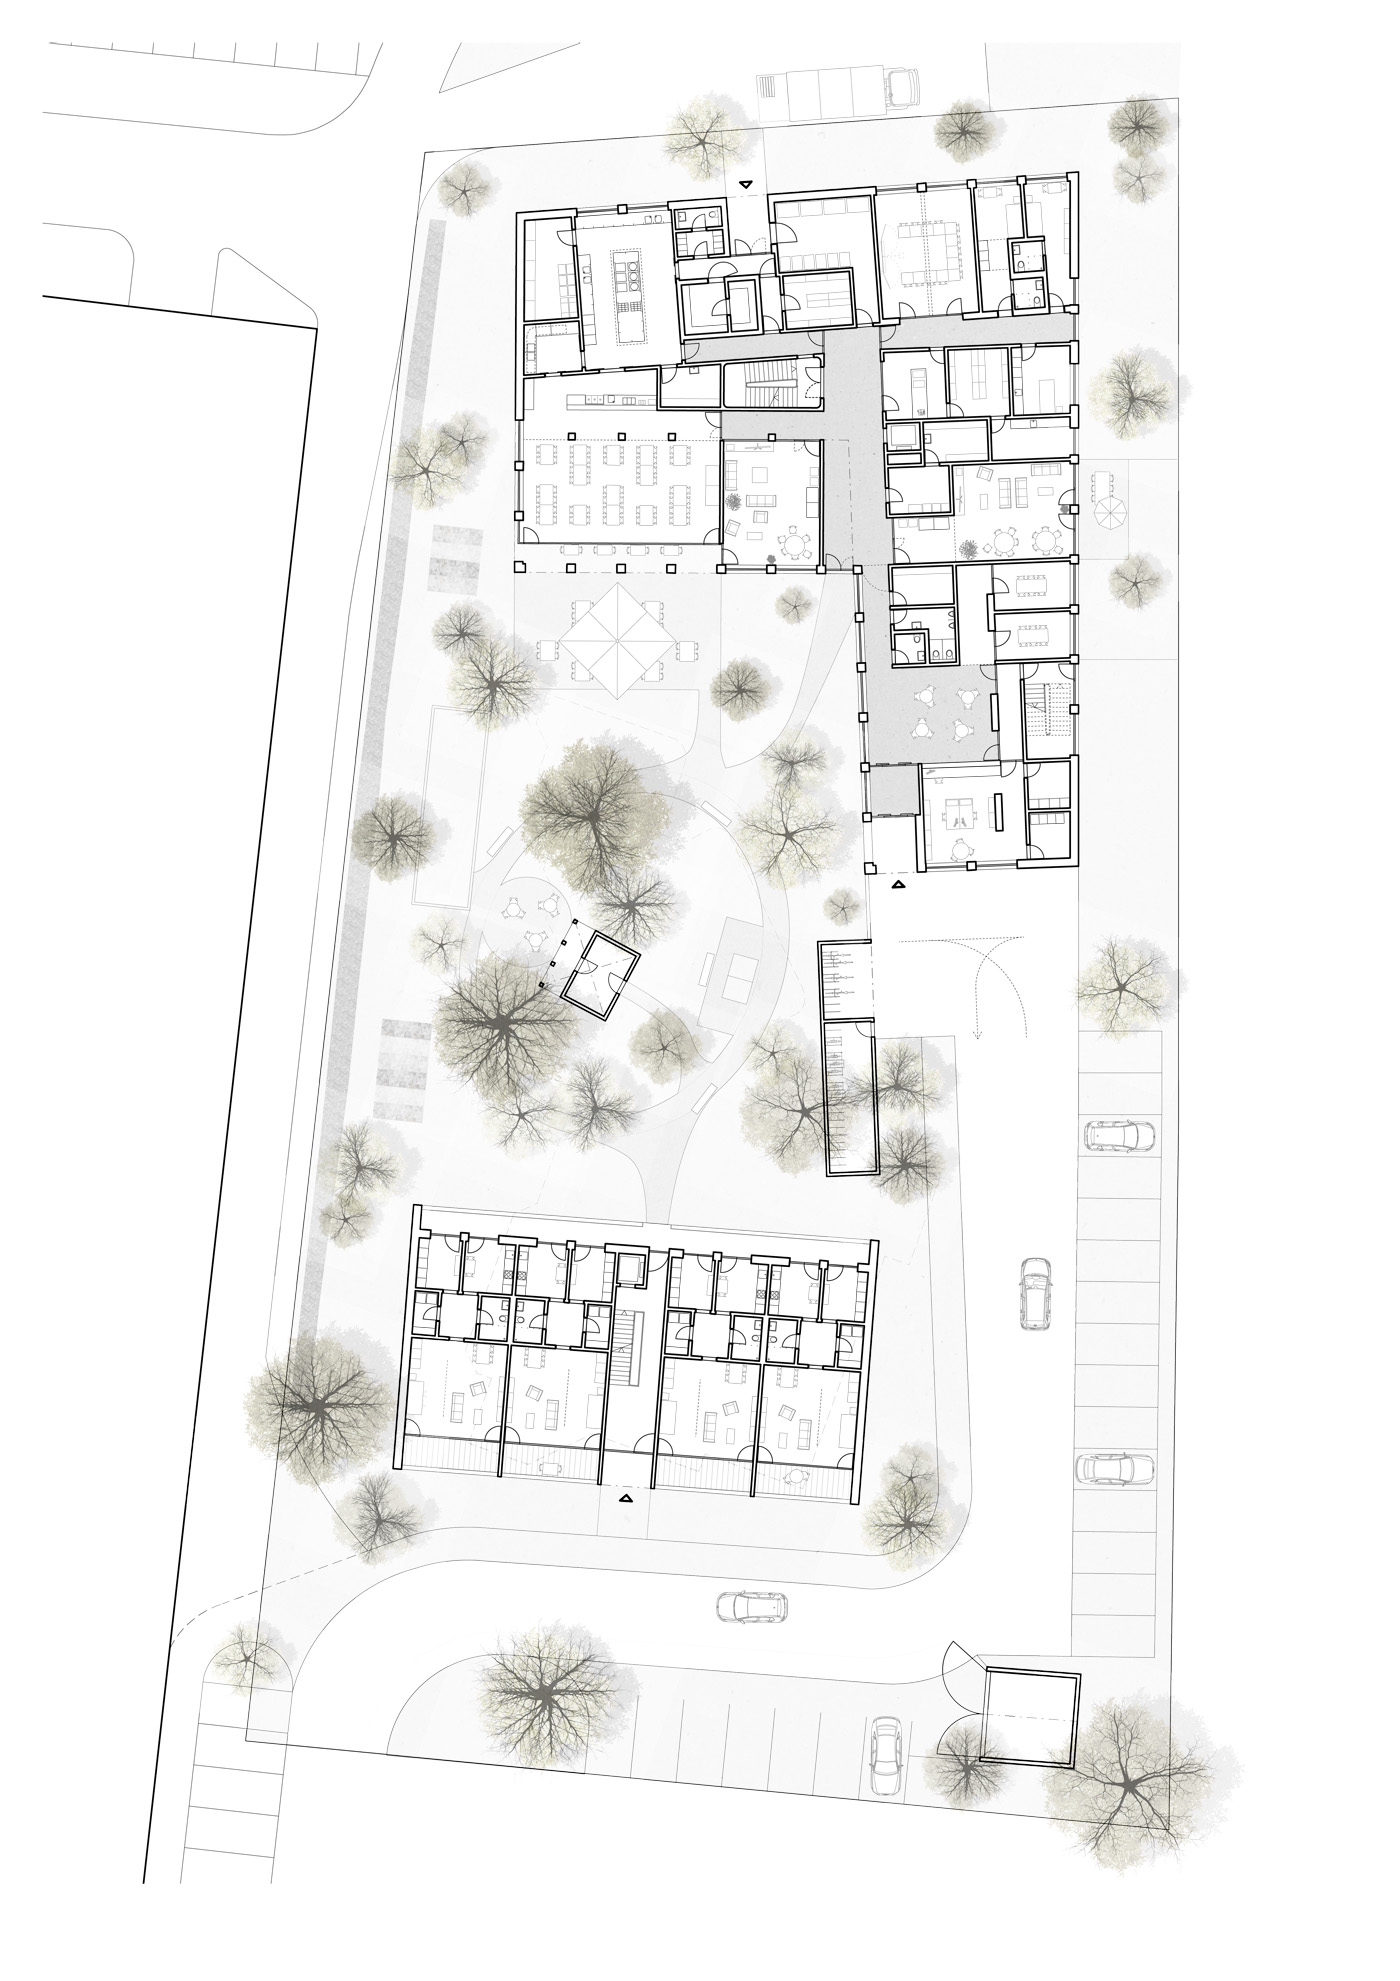 buan architekten – Studienauftrag Wohnheim Lindenfeld Emmen – Grundriss Erdgeschoss